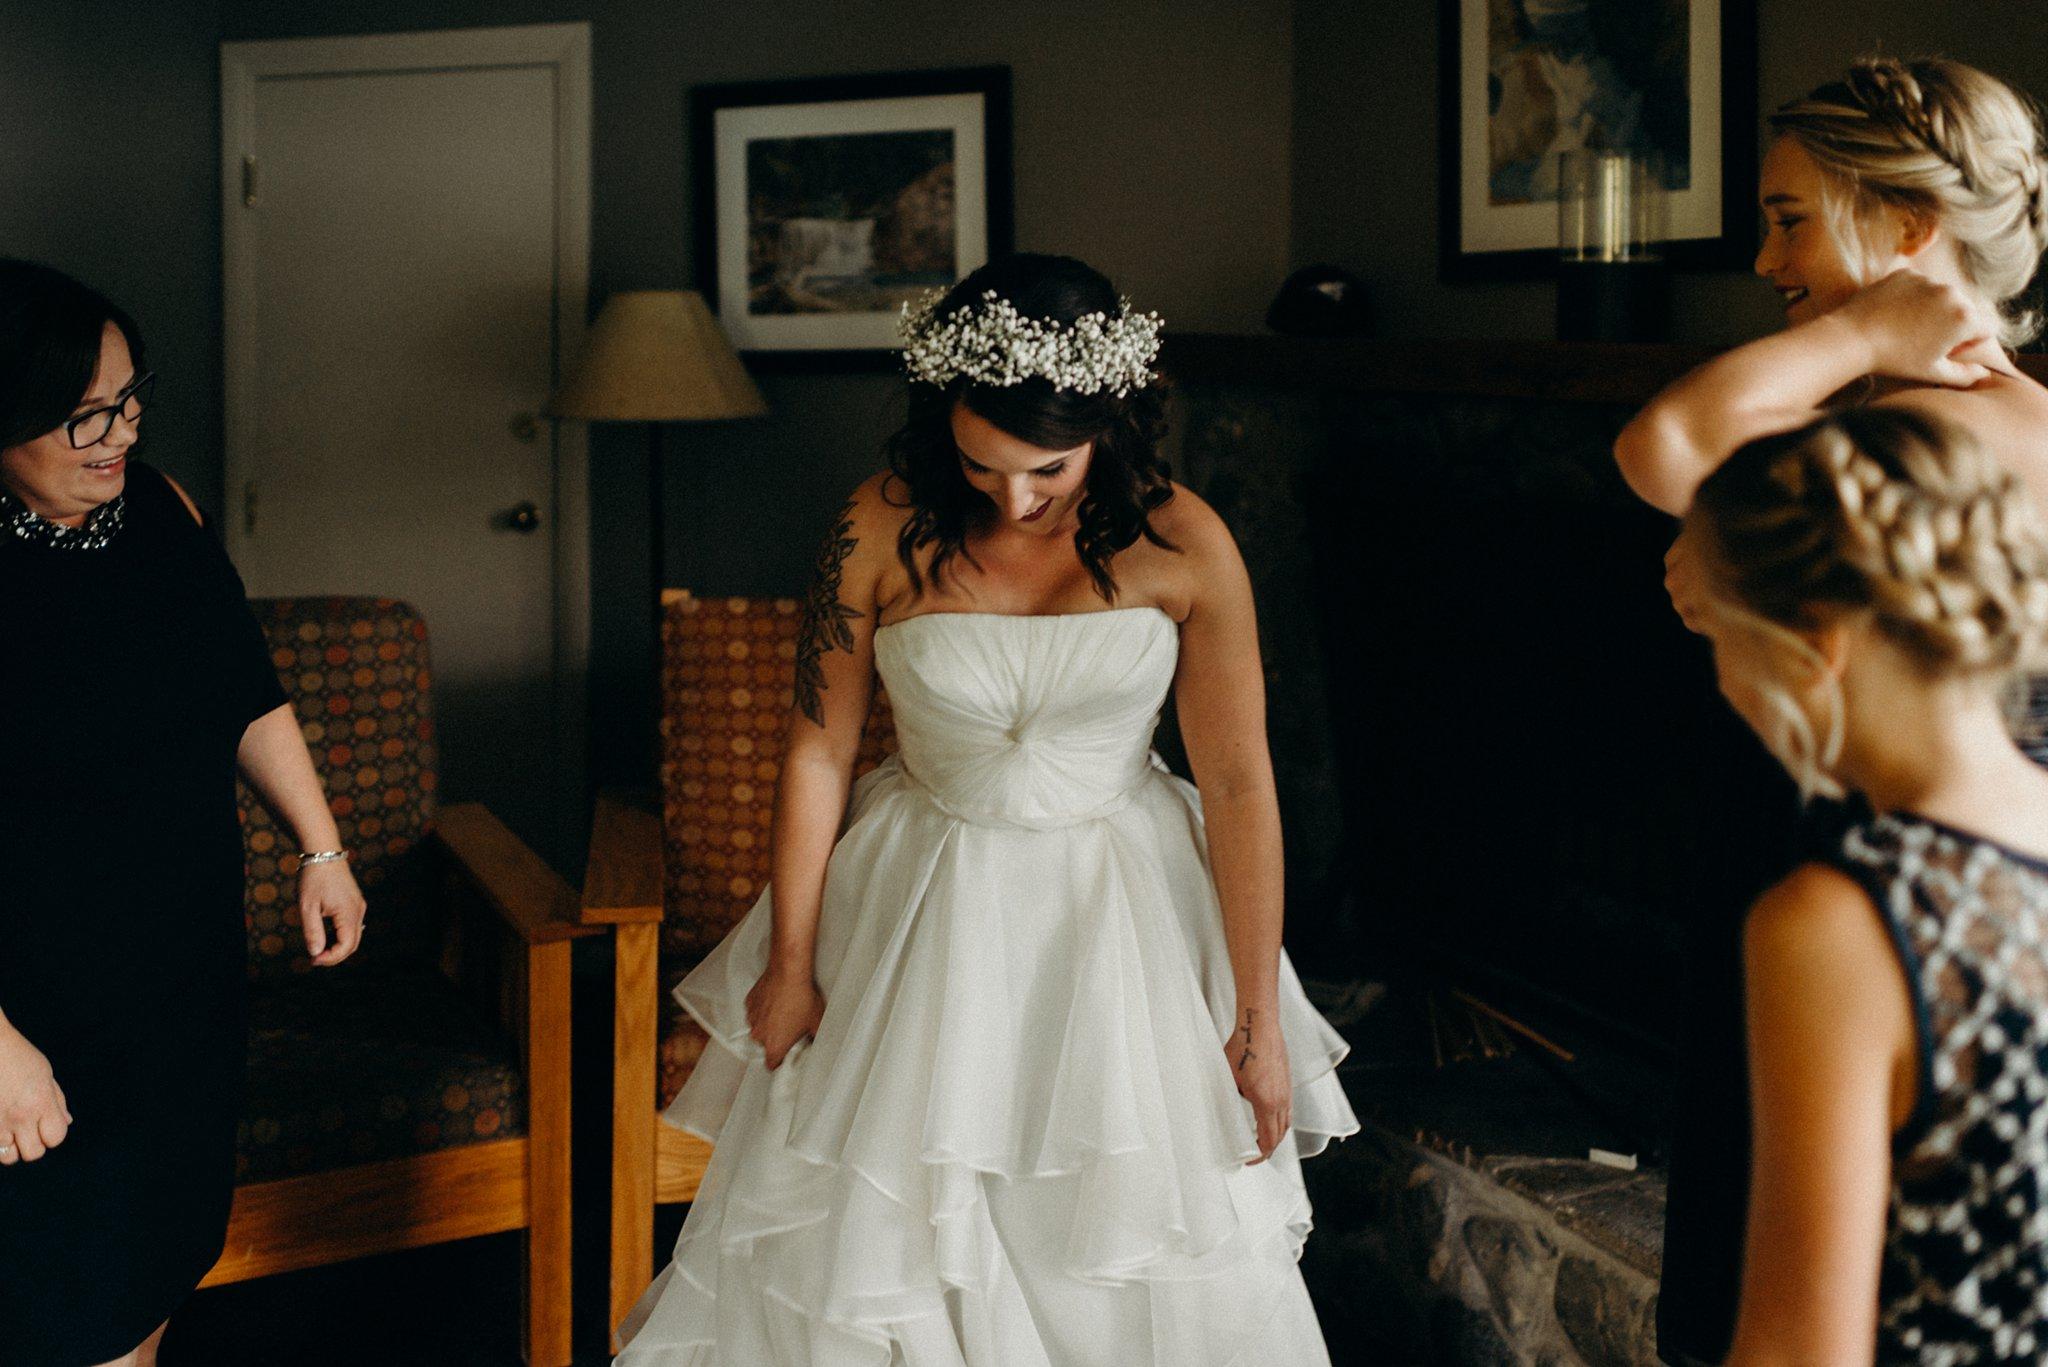 kaihla_tonai_intimate_wedding_elopement_photographer_6880.jpg